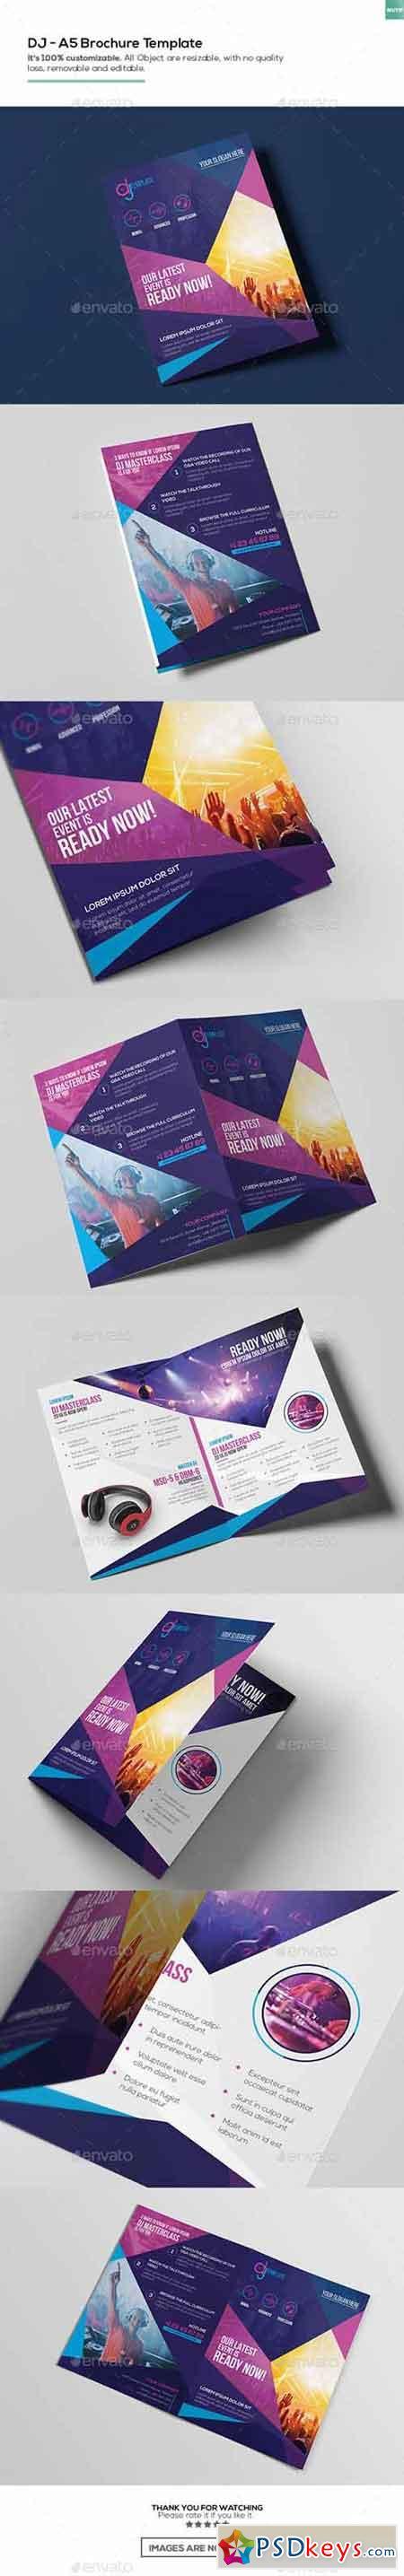 DJ A5 Brochure Template 15993857